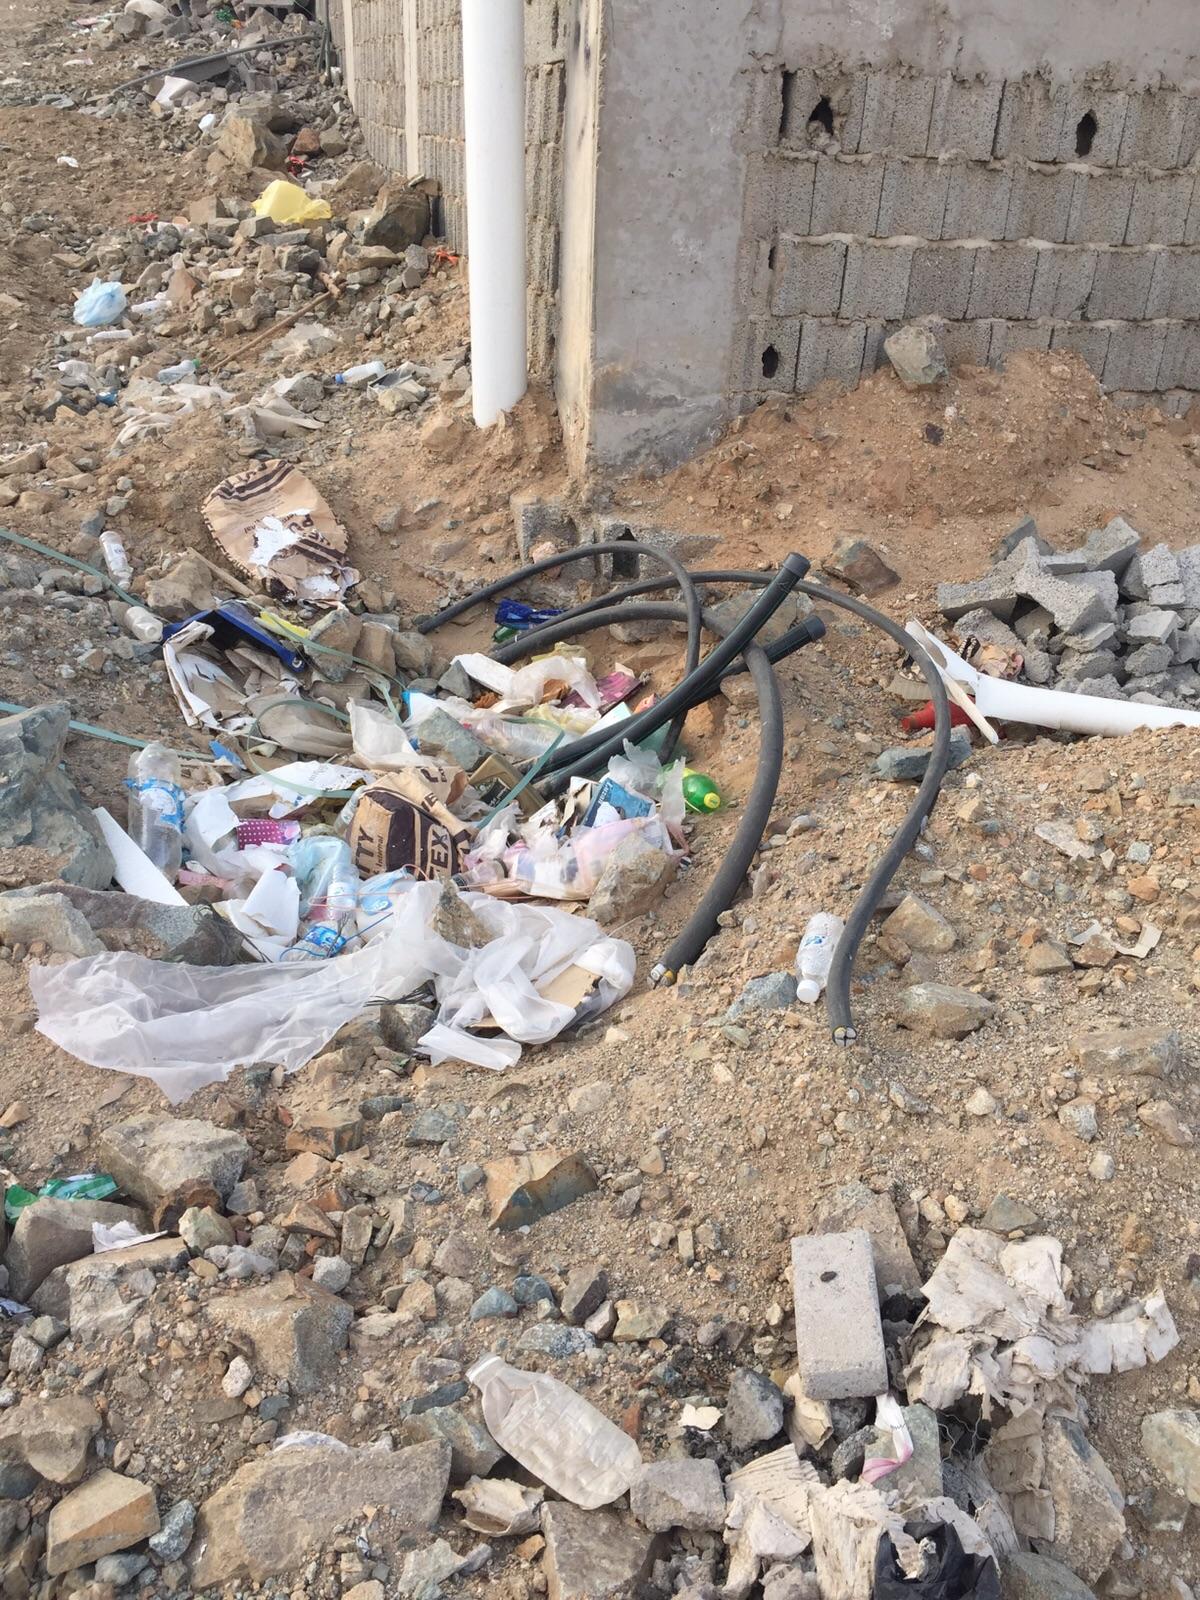 كيبل كهربائي مشكوف بحي كيلو14 شمال جدة (2)